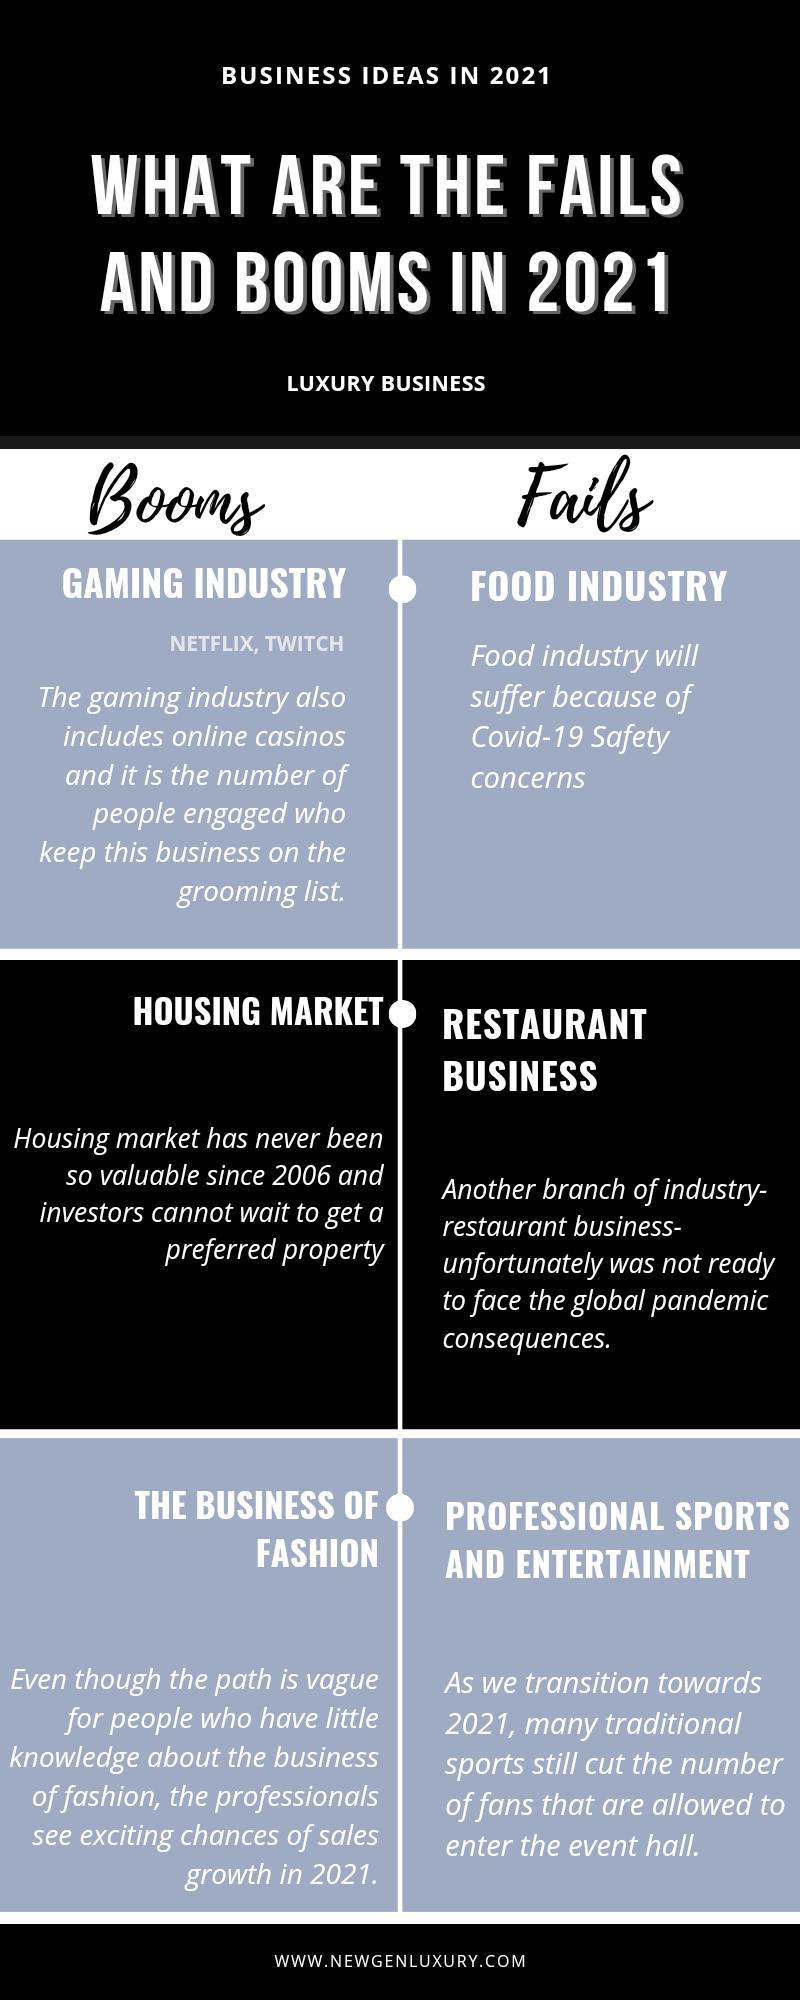 Business ideas in 2021